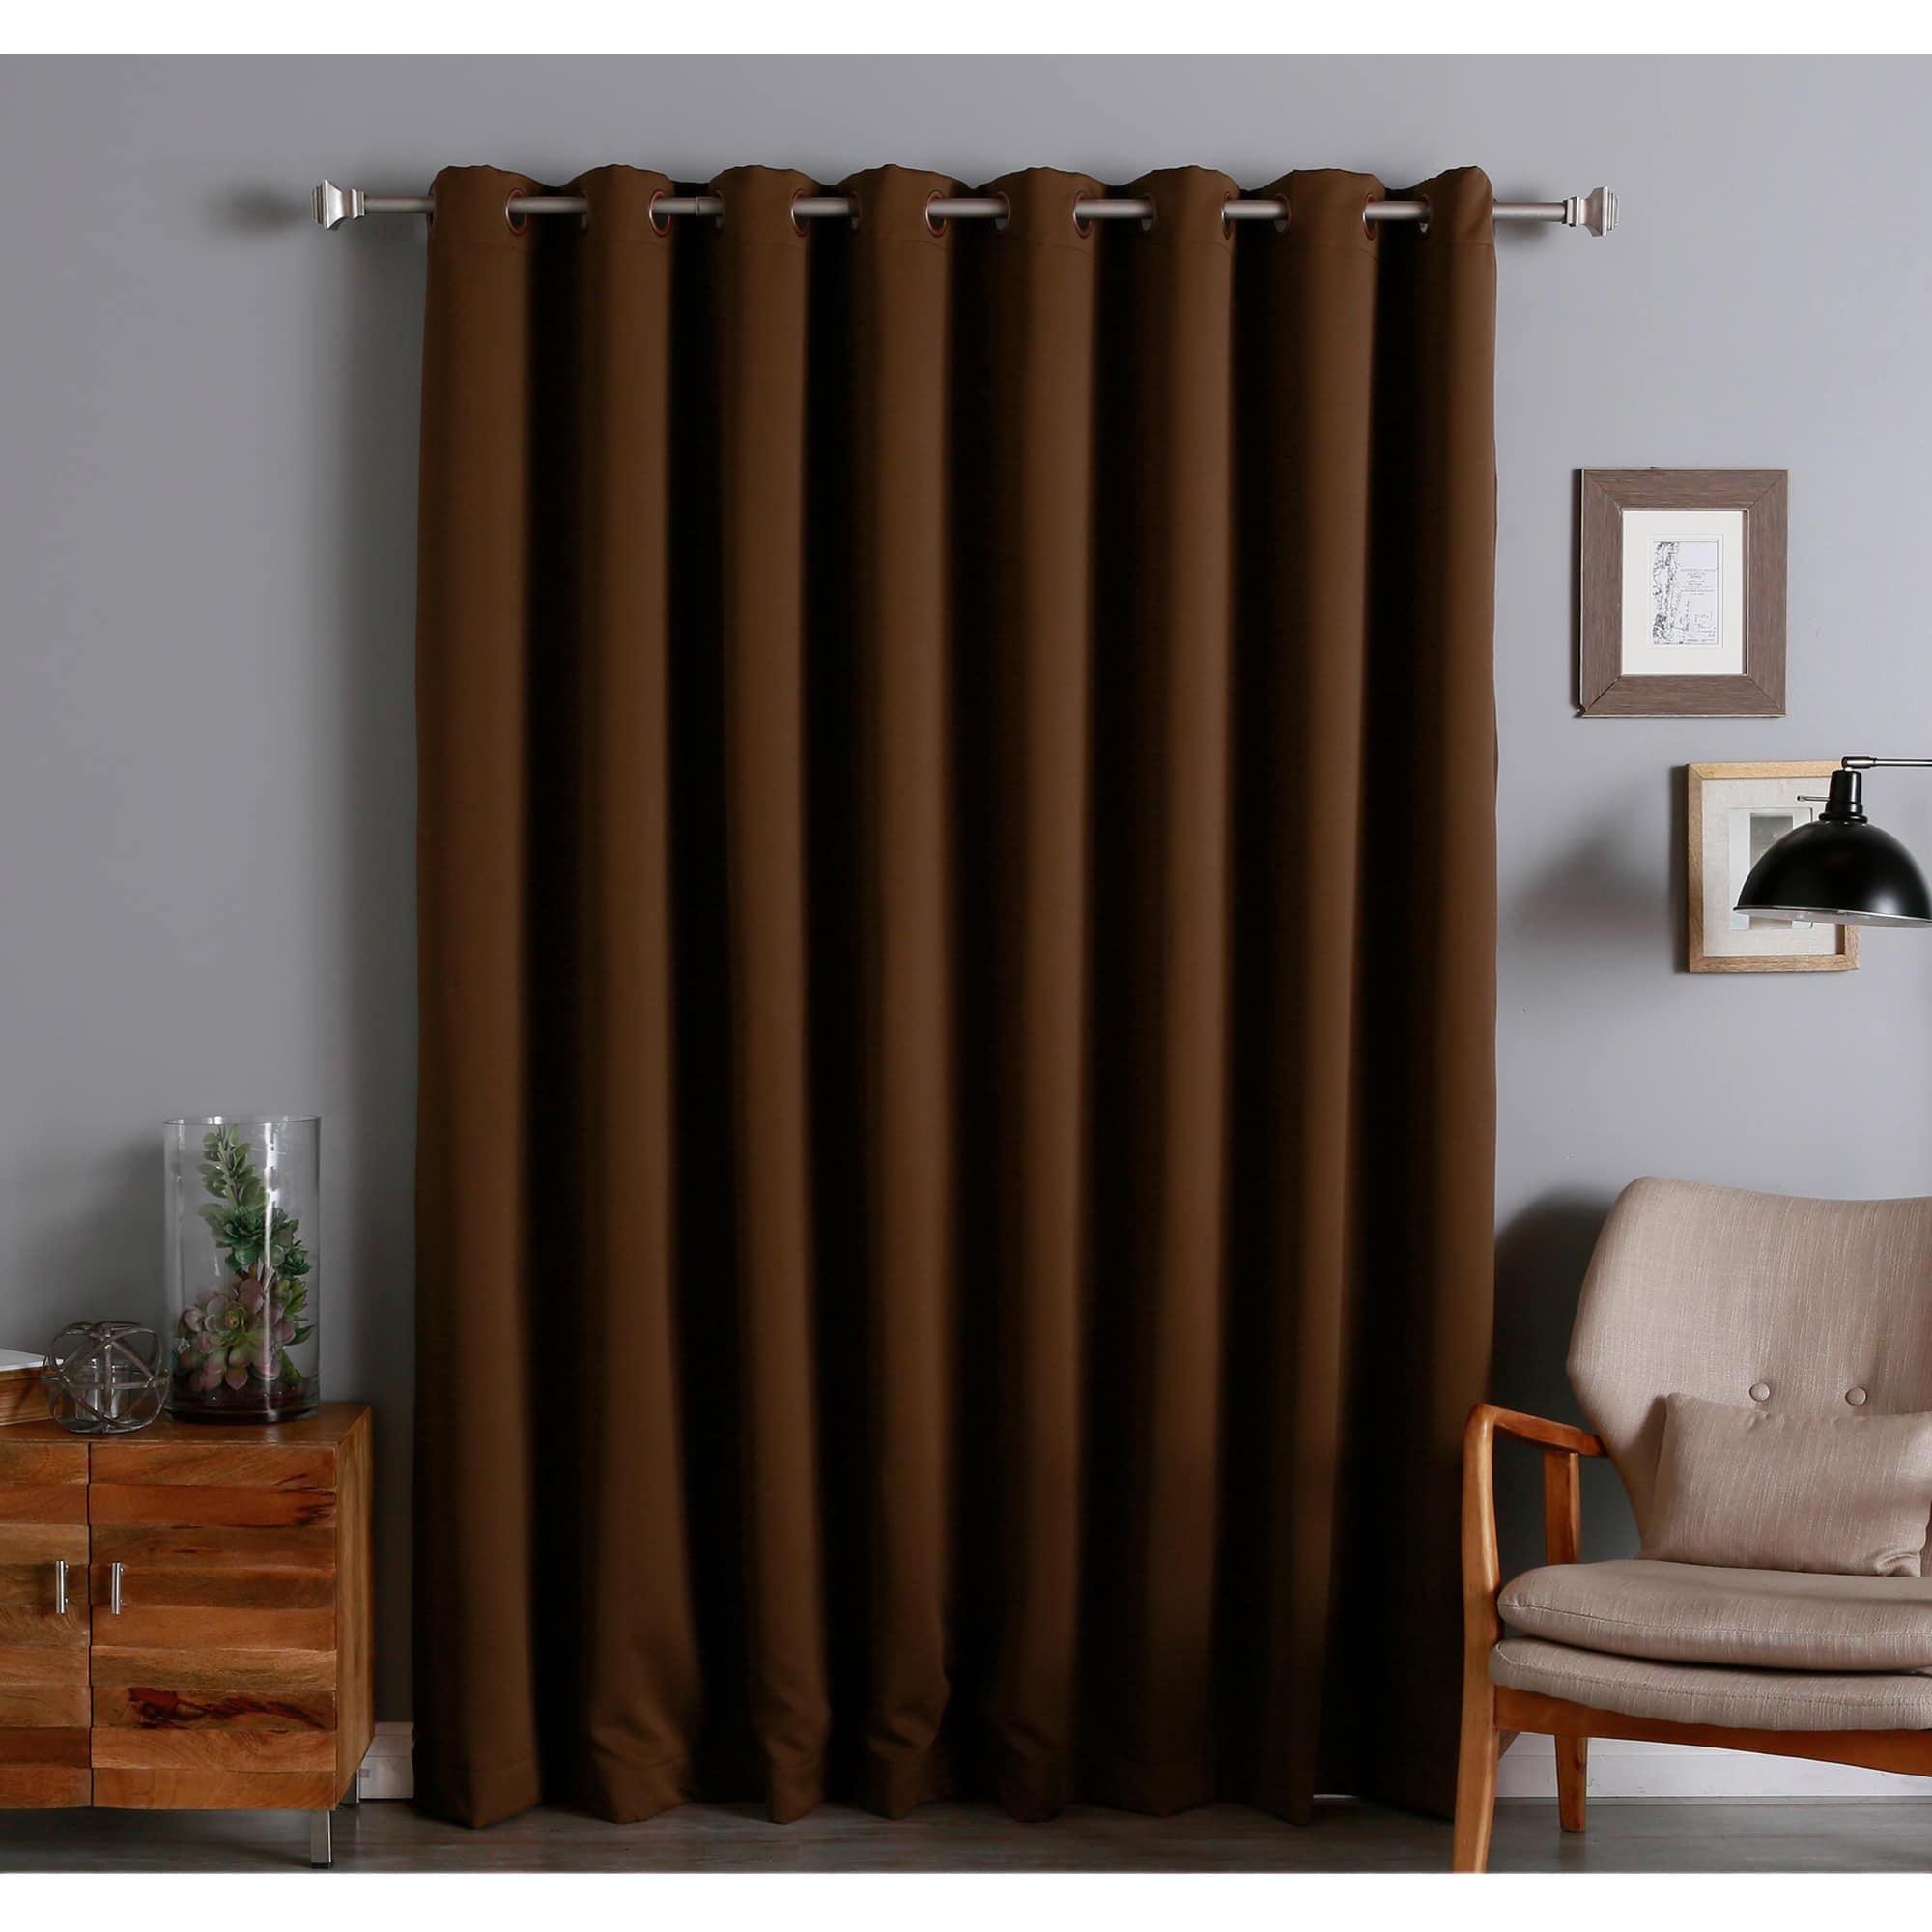 walmart inch ip com drapes rod decopolitan adjustable long urn set double curtain